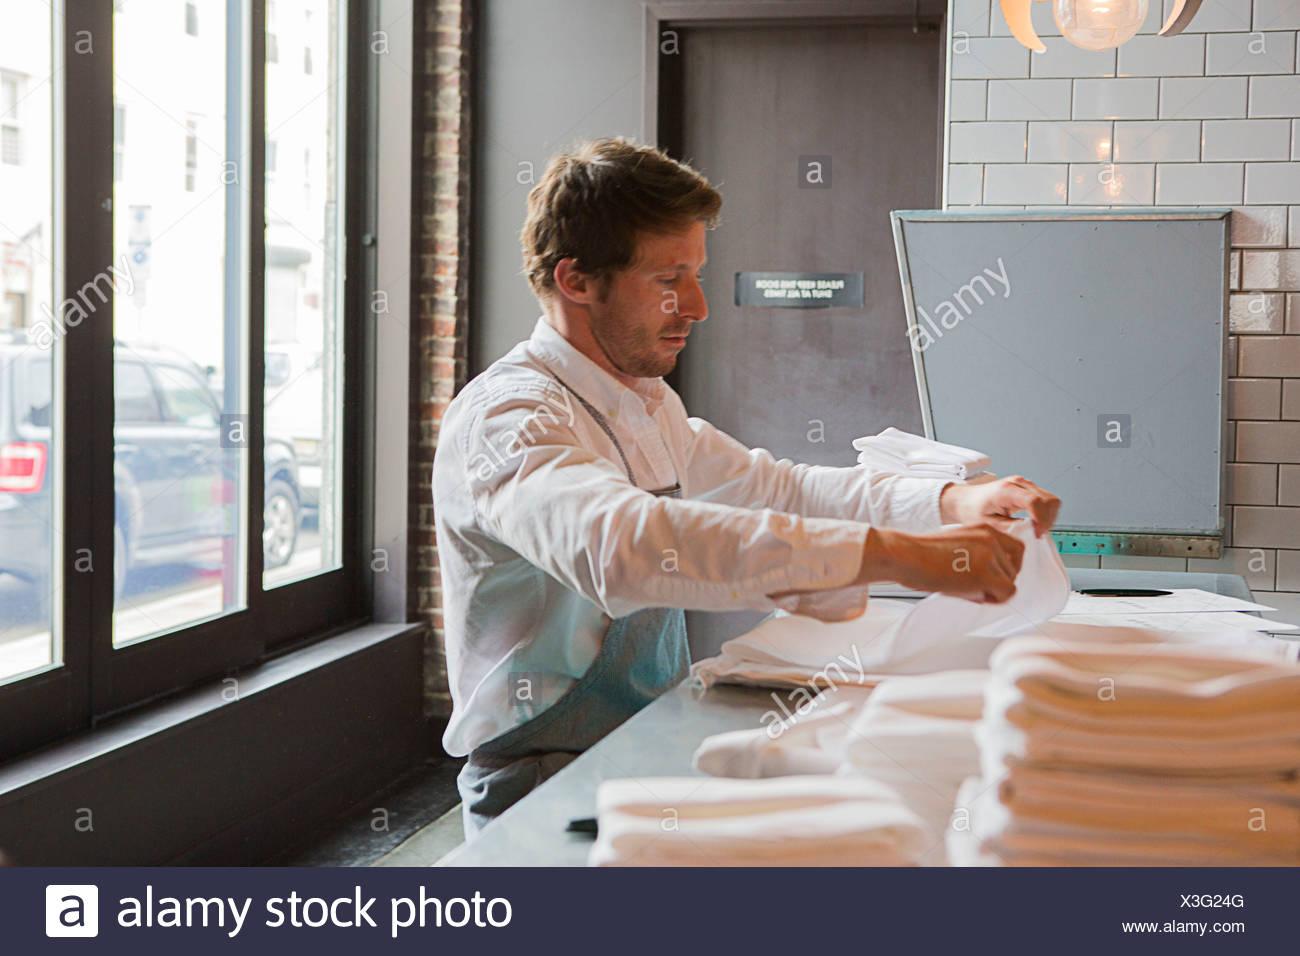 Chef preparing napkins in restaurant - Stock Image